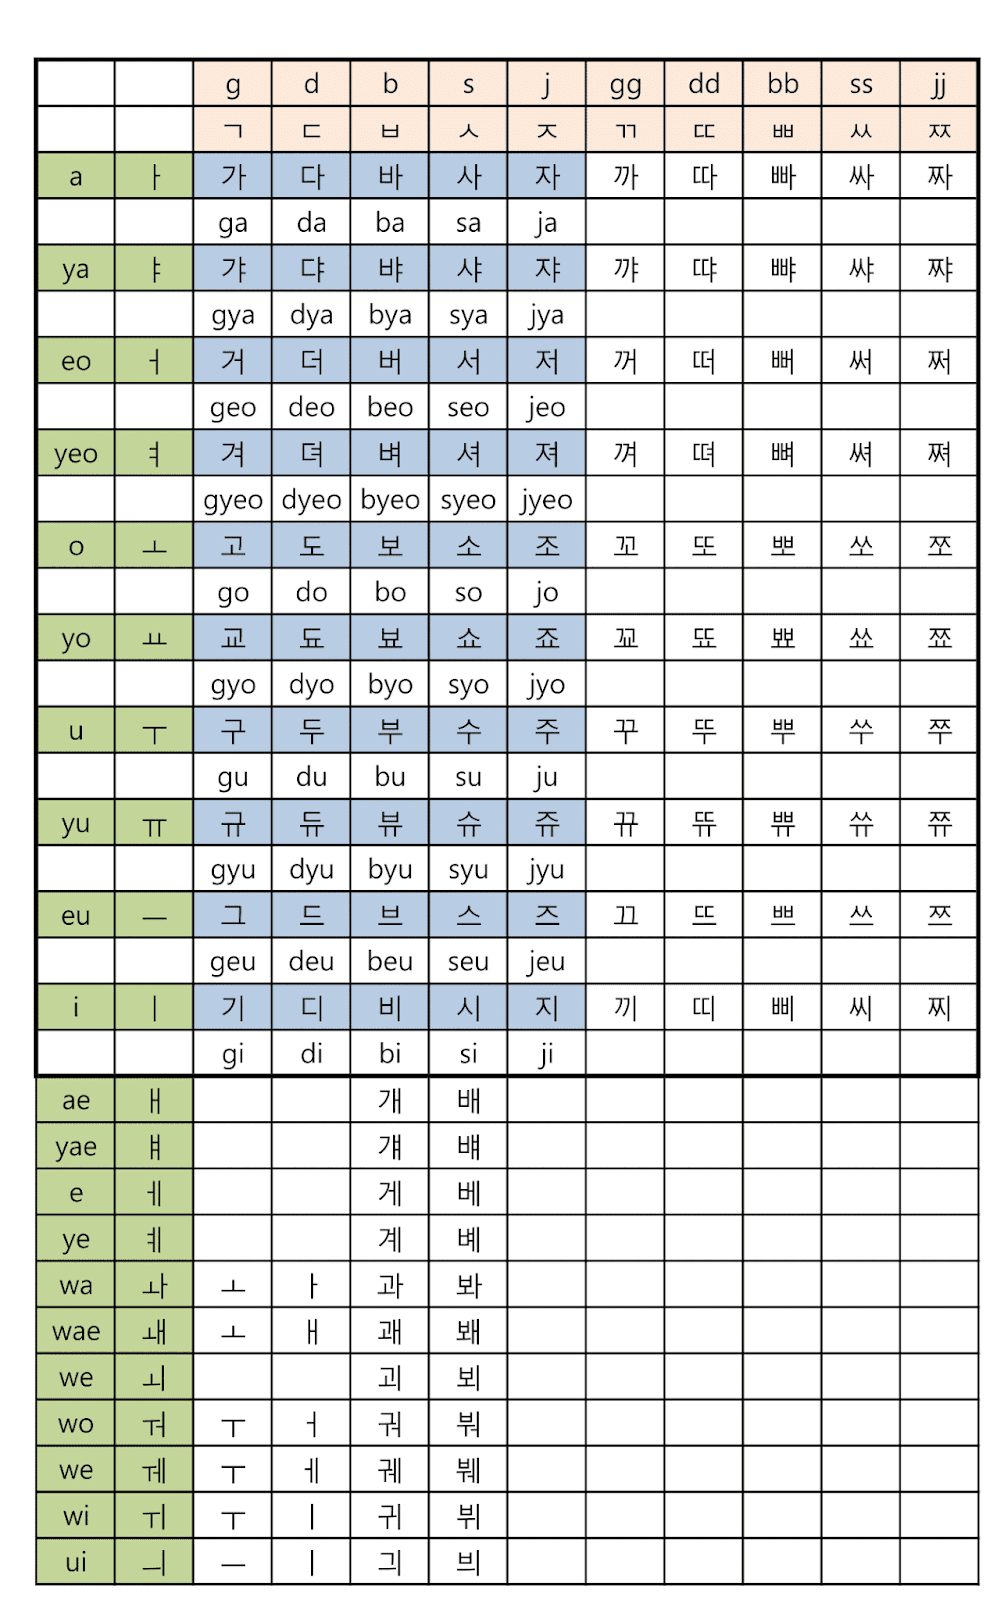 Korean Alphabet Chart 2 Additional Consonants Vowels